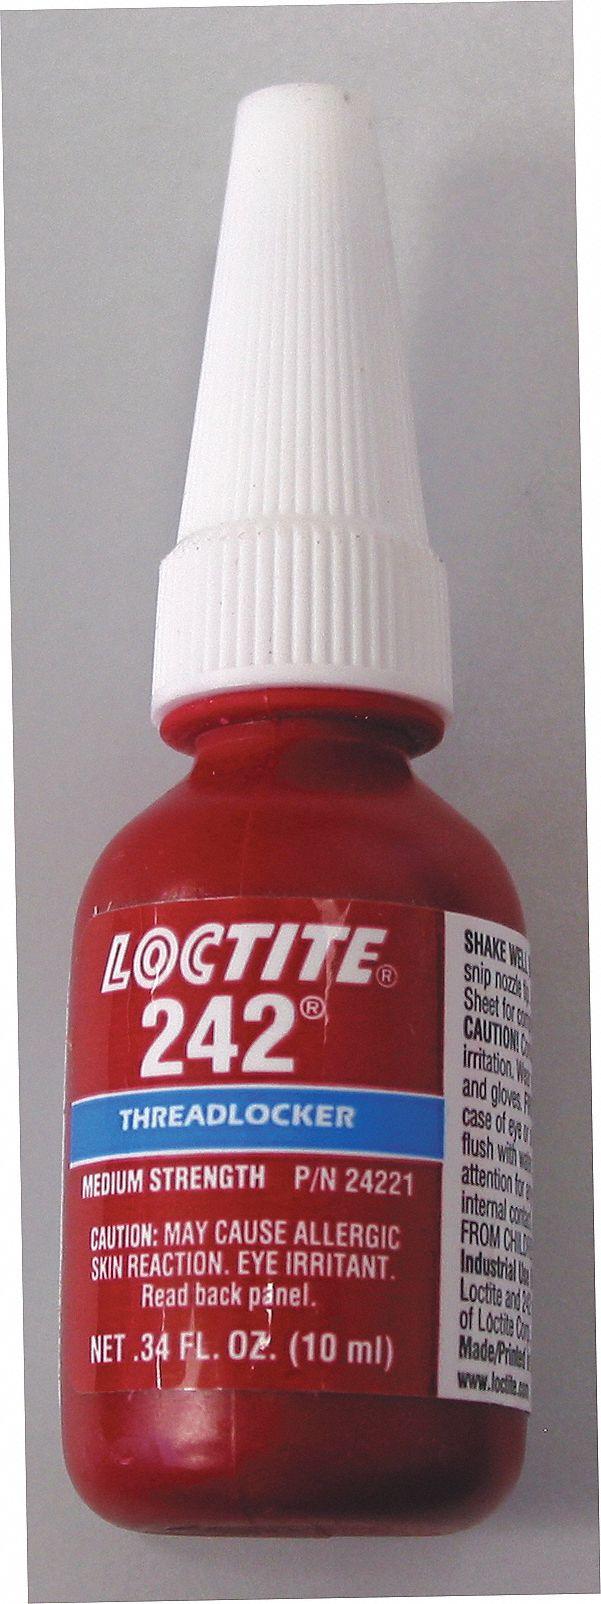 Loctite 24205 Threadlocker 242 Med Strength